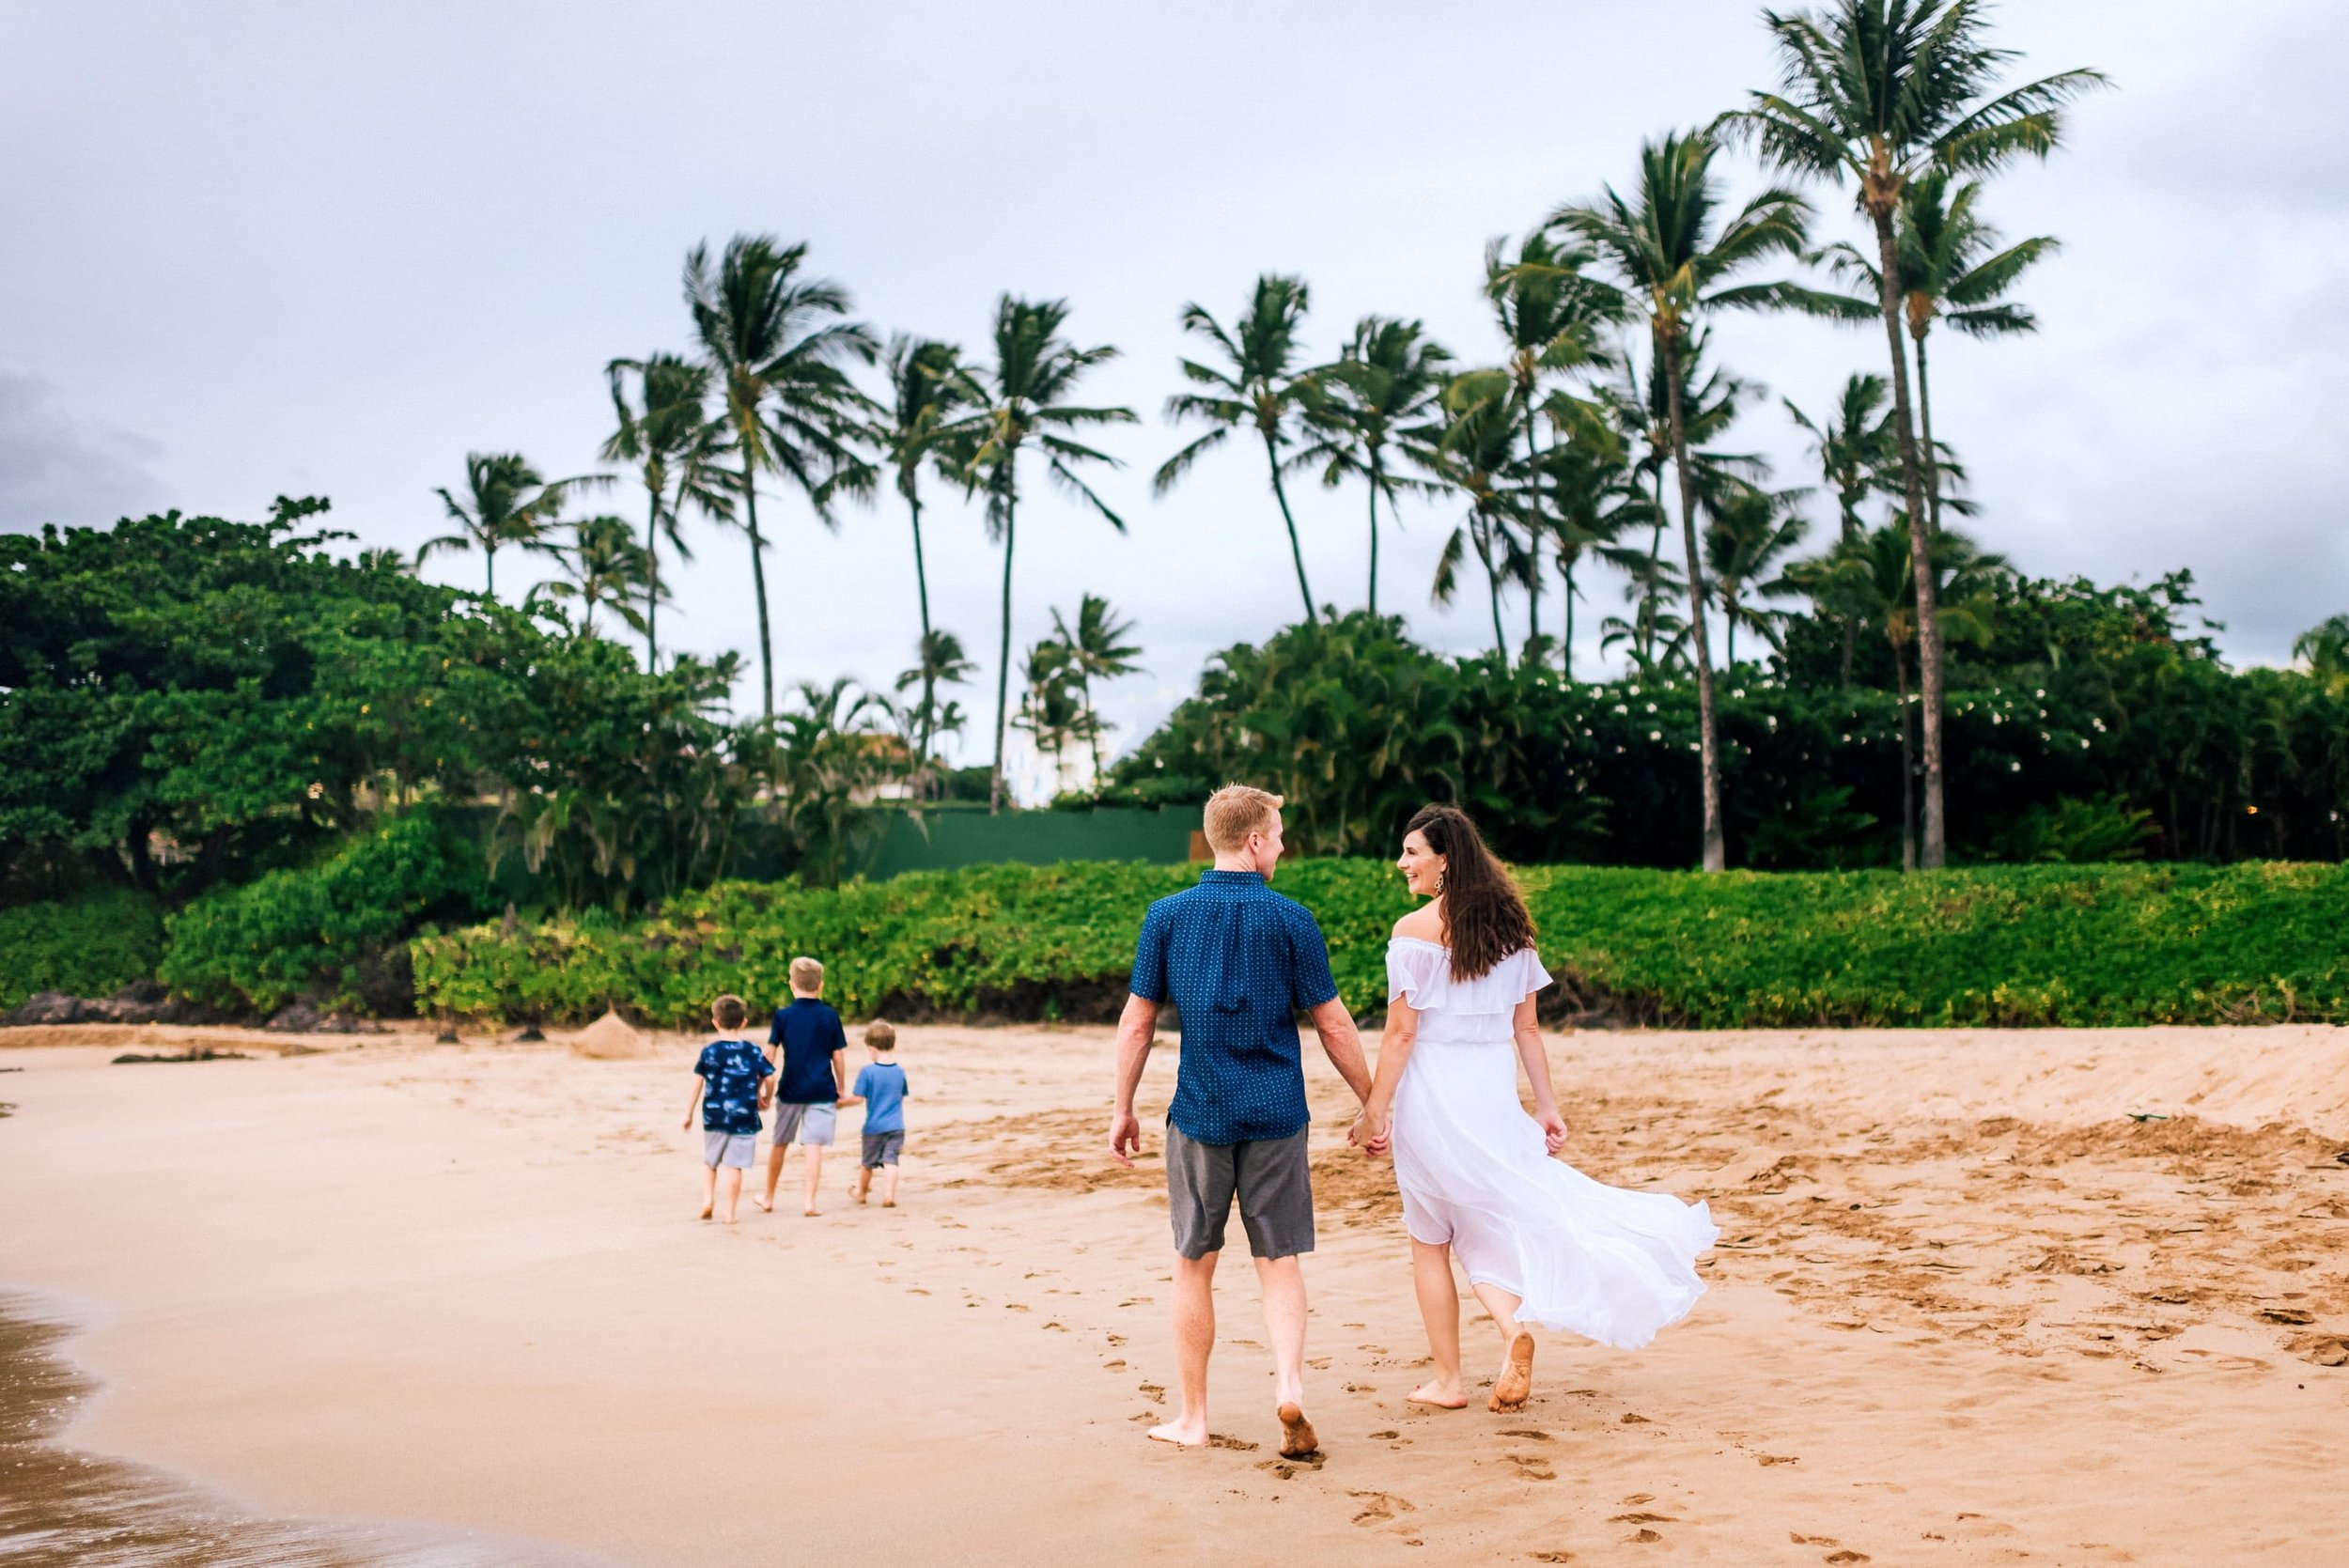 Love-Maui-Family-Photographer-Water-Hawaii-17.jpg